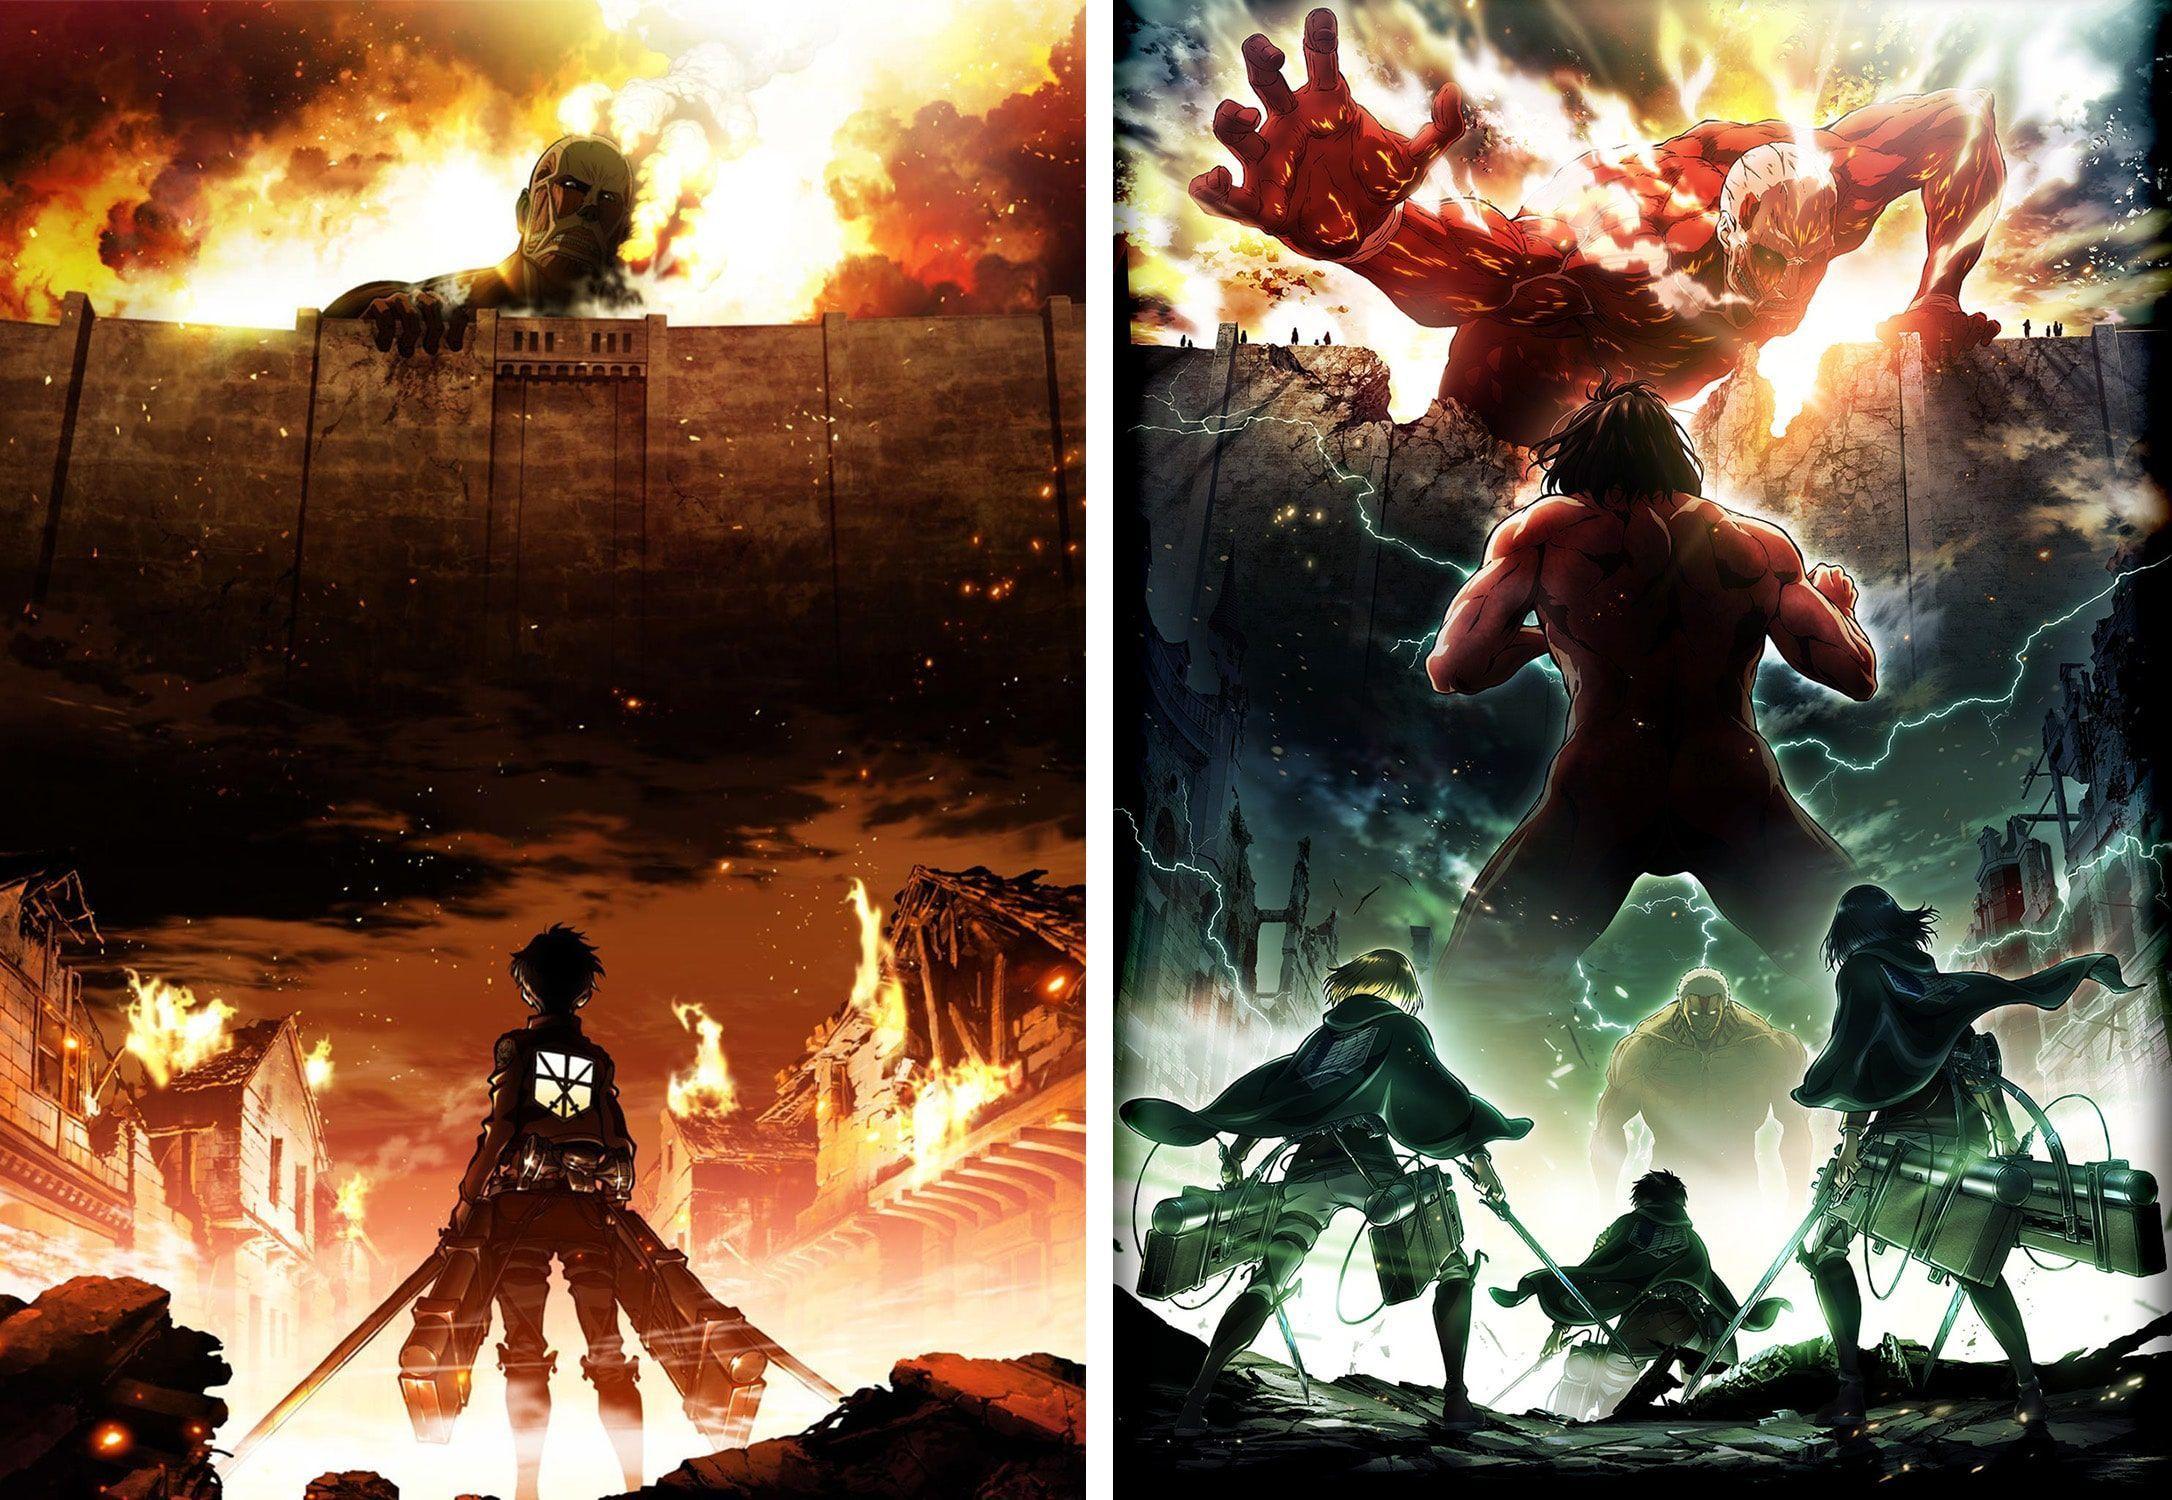 attack on titan season 1 and 2 fight pinterest attack on titan